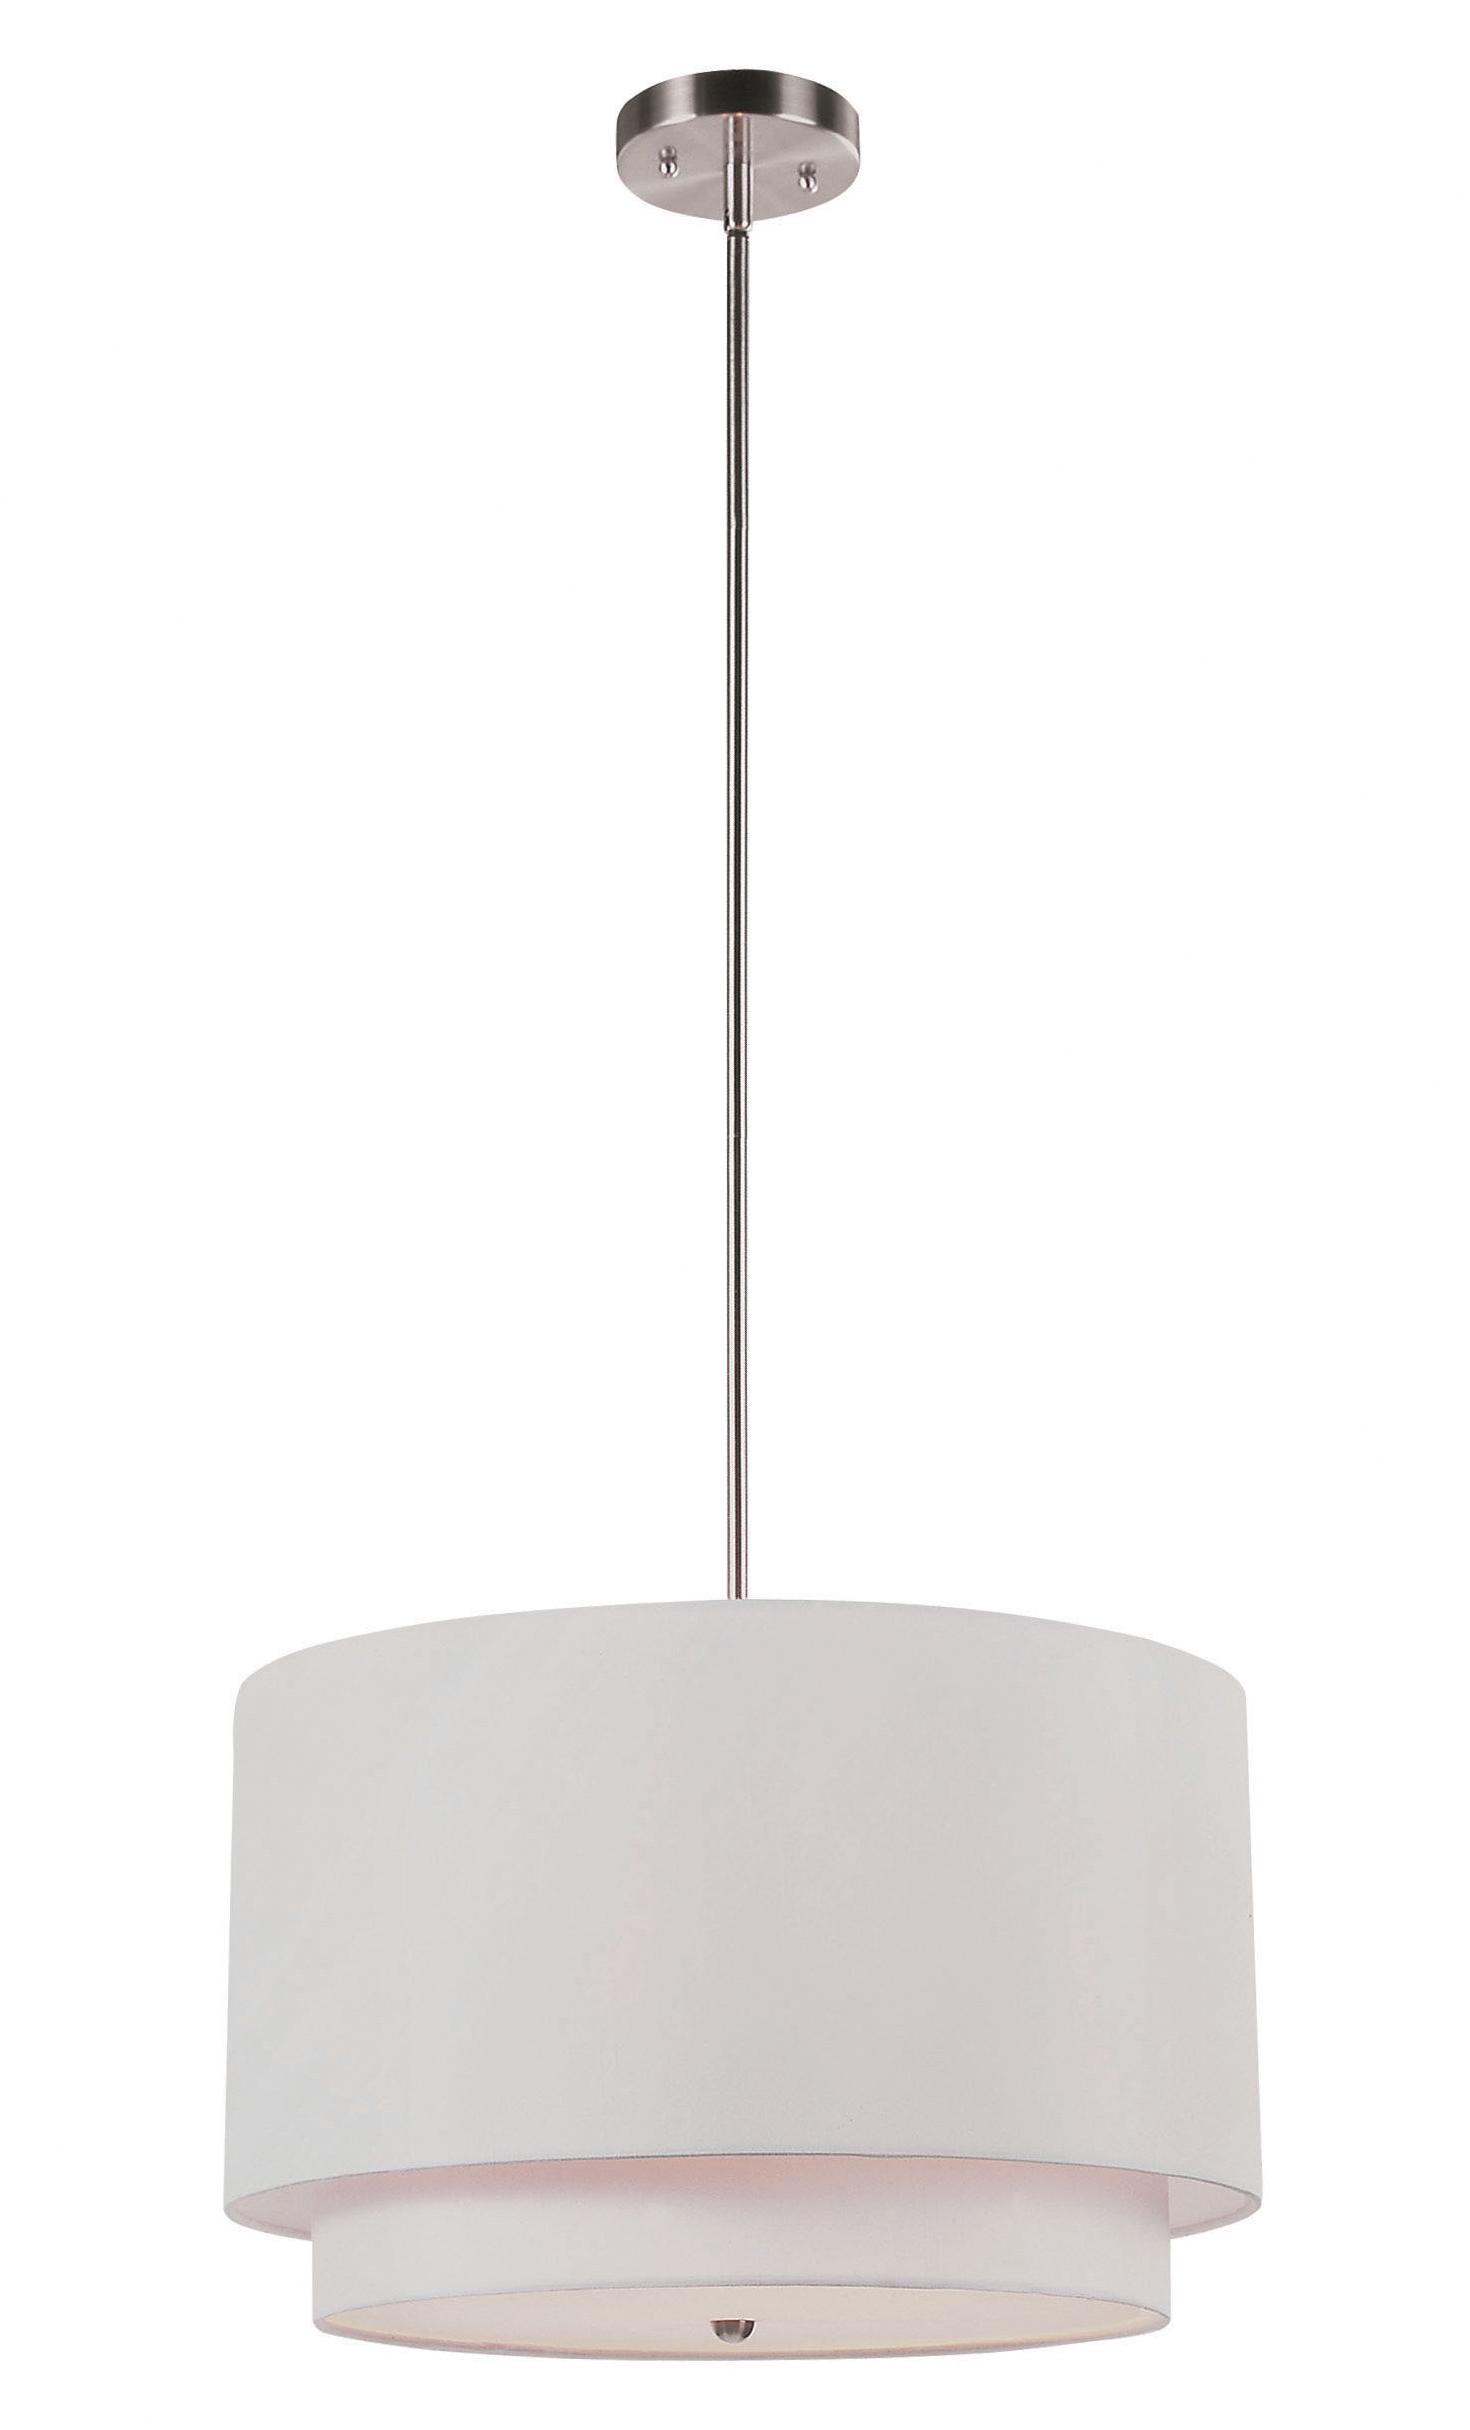 Kasey 3-Light Single Drum Pendants pertaining to Best and Newest Friedland 3-Light Drum Tiered Pendant